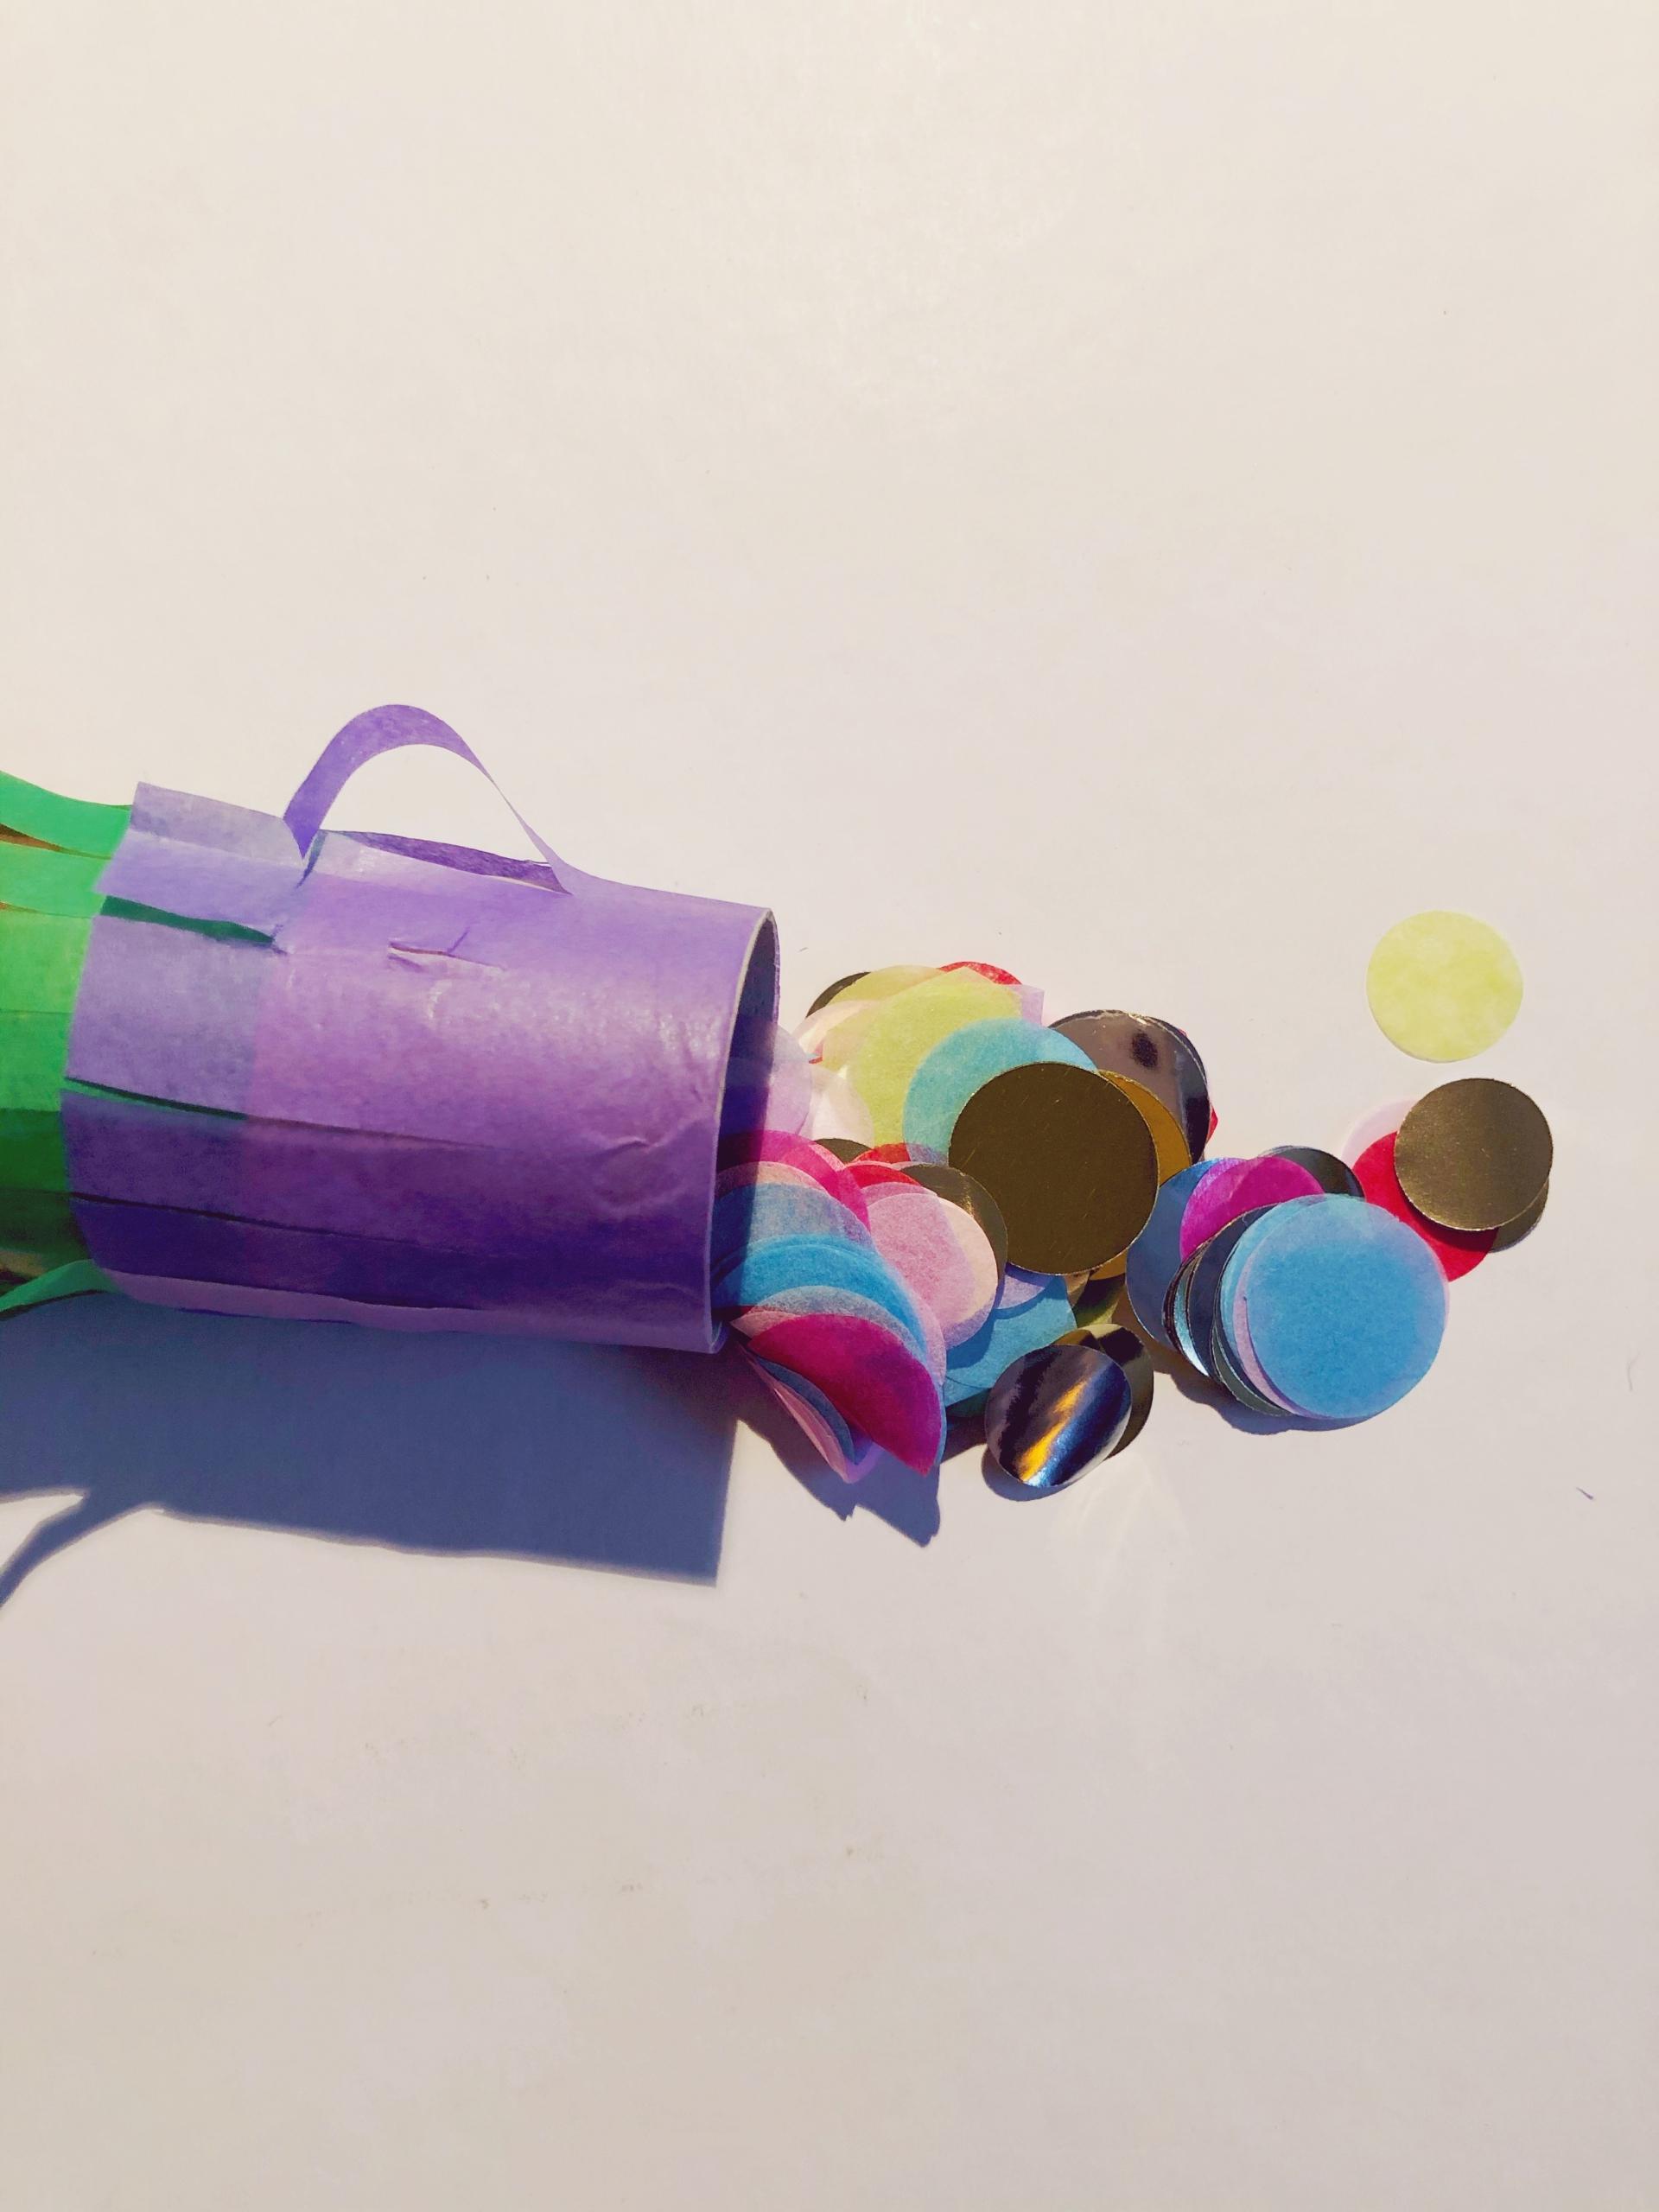 DIY Konfetti-Rakete mit Konfetti befüllen